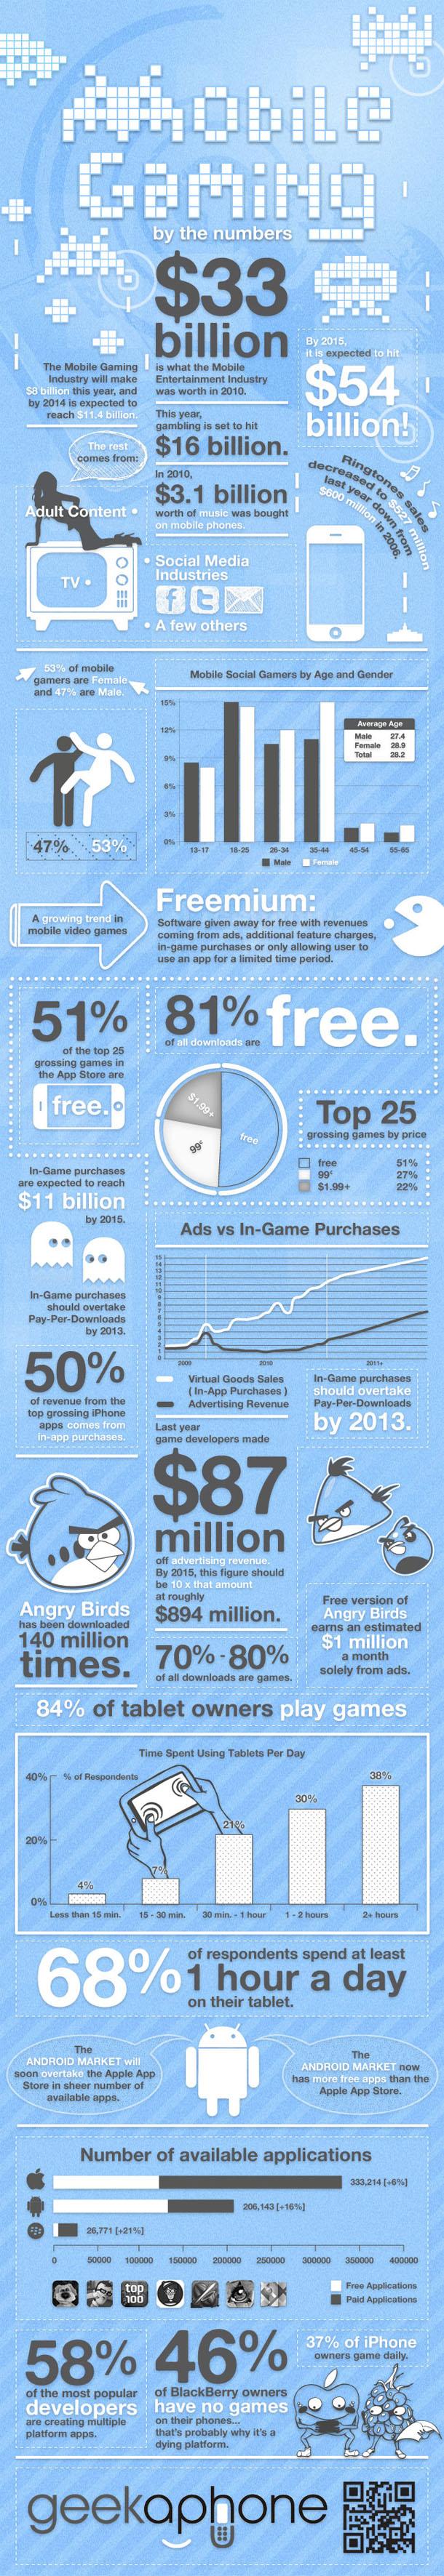 infografia videojuegos moviles